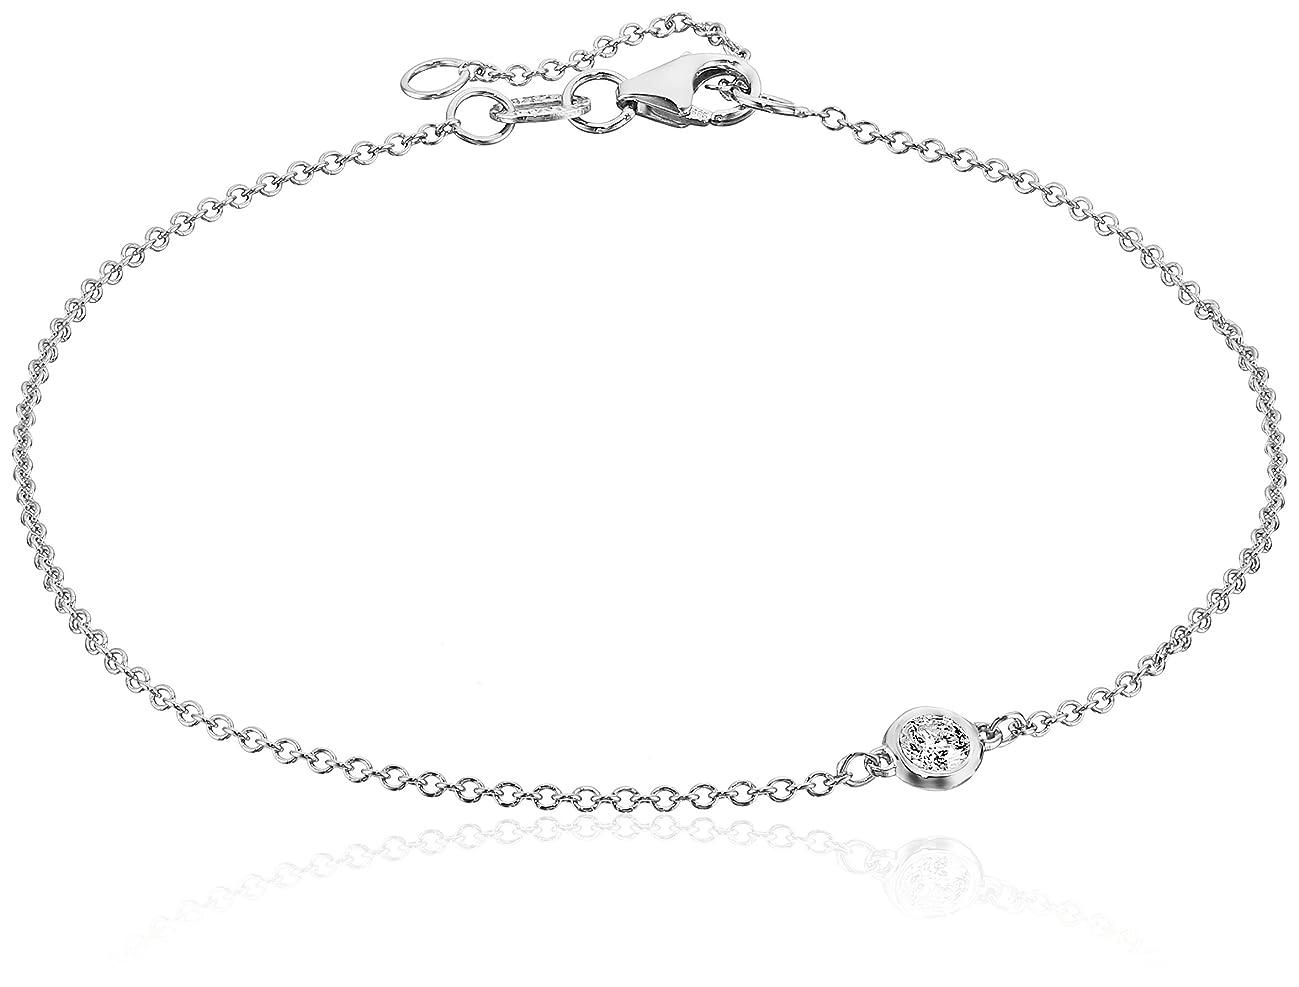 14k Gold Solitaire Bezel Set Diamond with Lobster Clasp Strand Bracelet (J-K Color, I2-I3 Clarity)